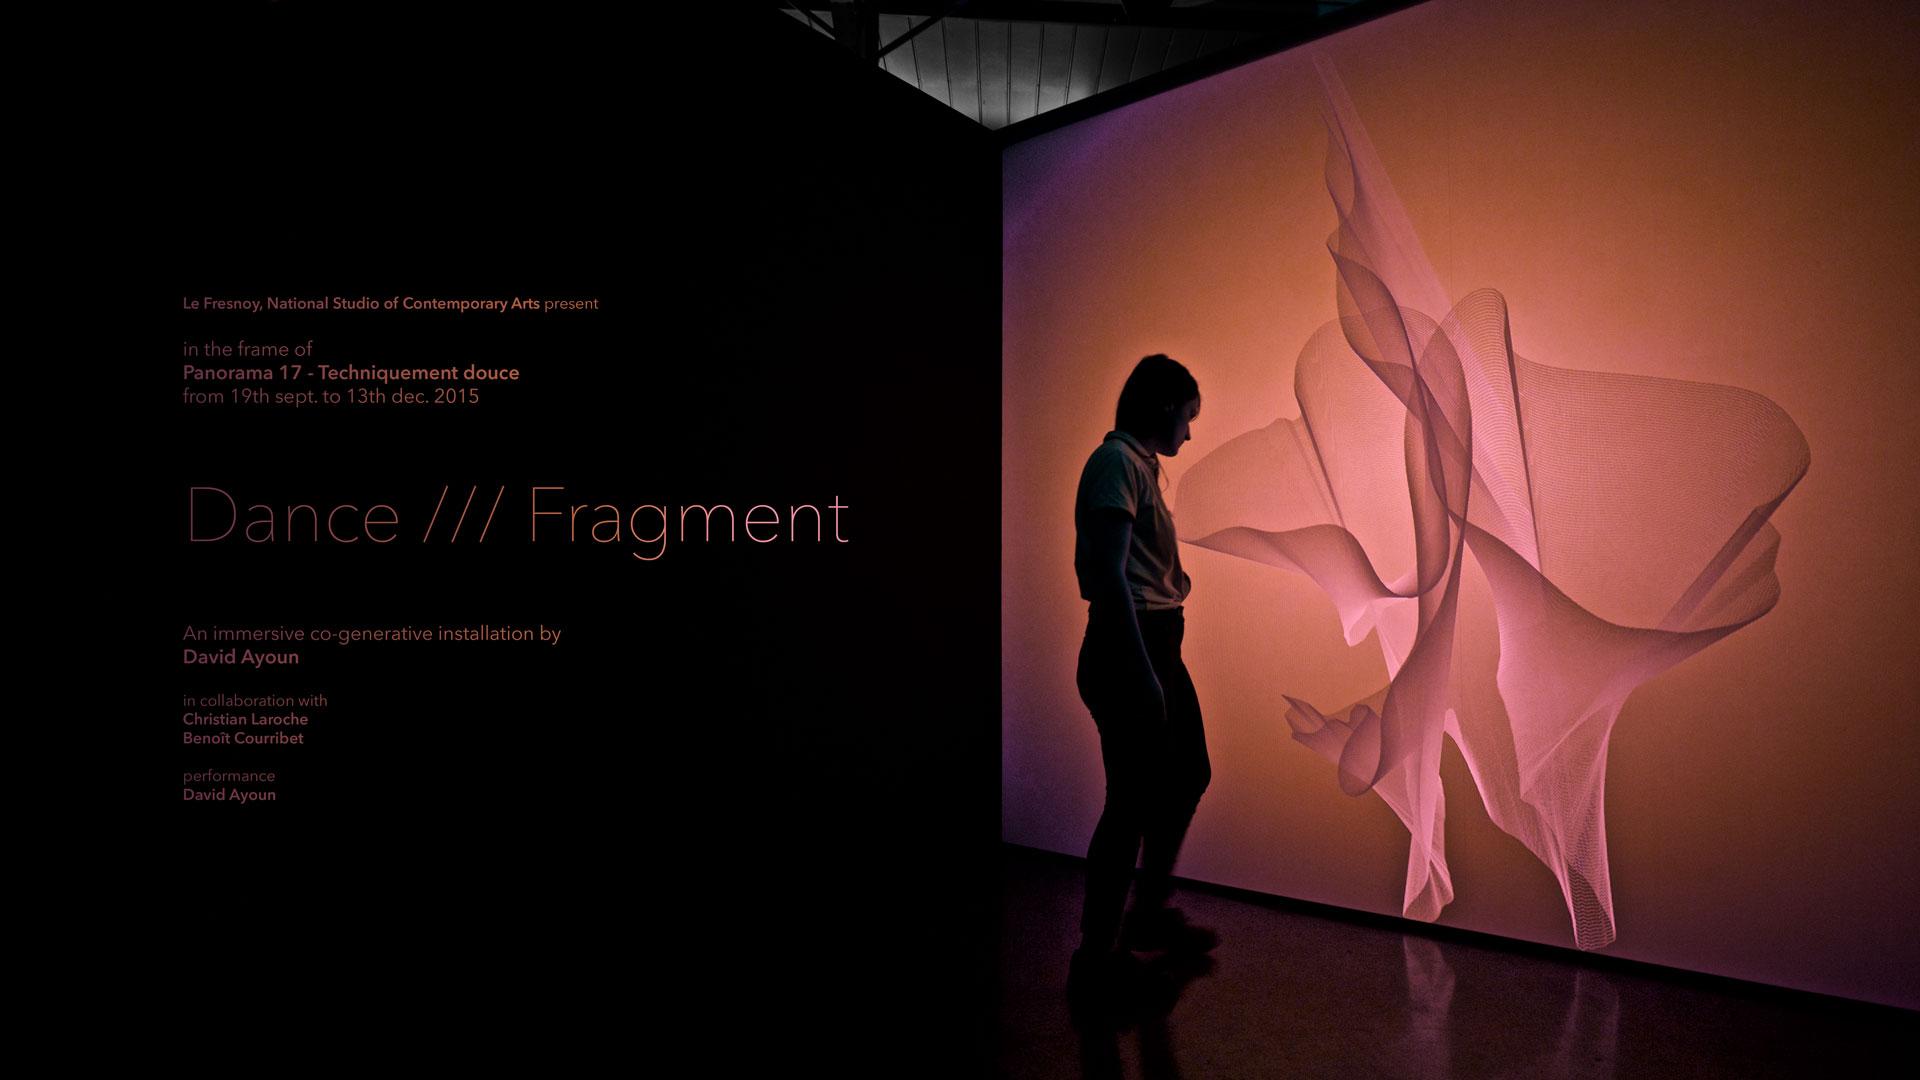 Dance /// Fragment (2015)